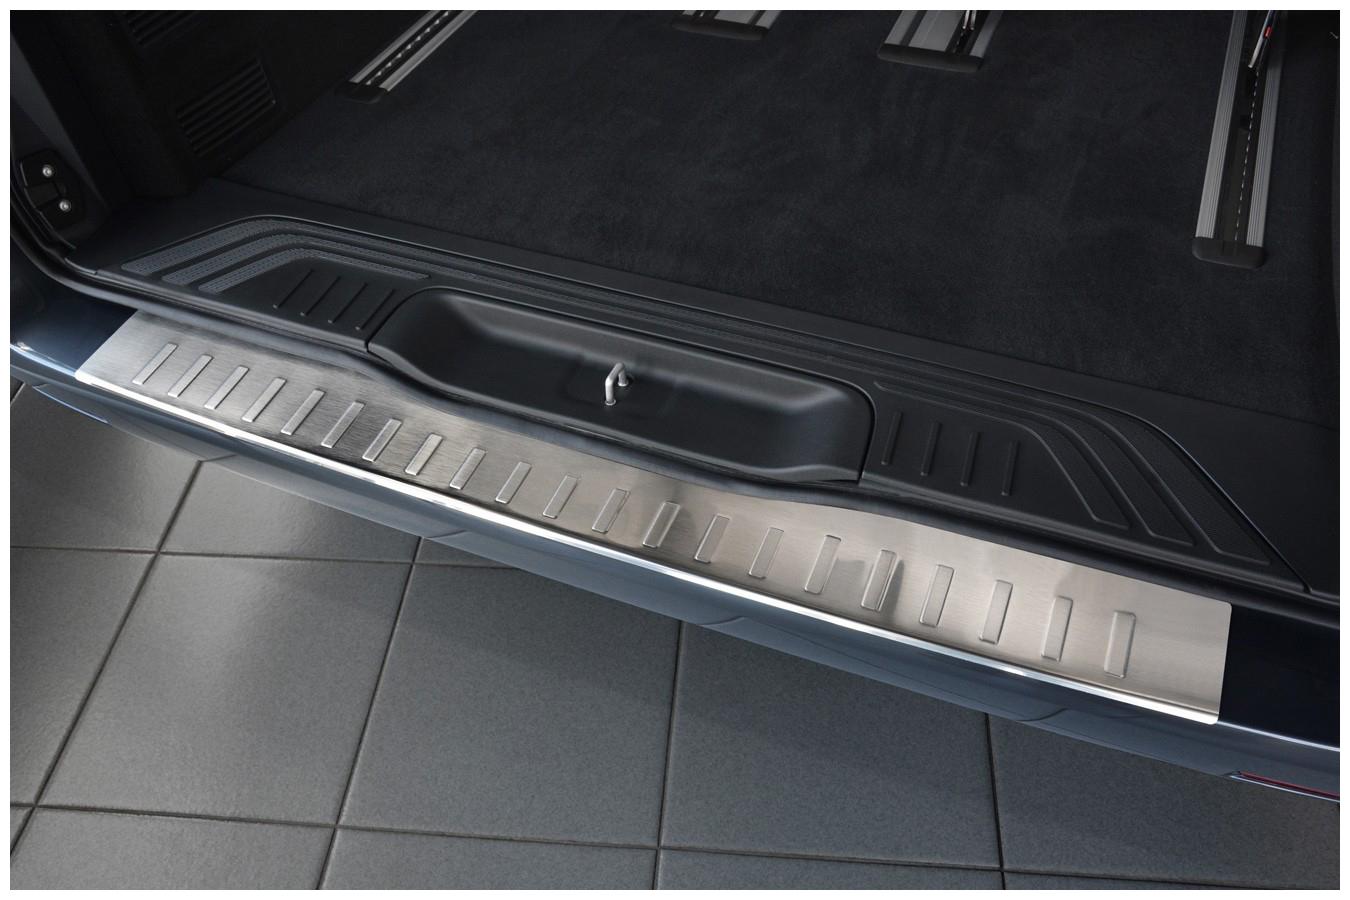 Edelstahl Ladekantenschutz für Mercedes V-Klasse Vito W447 Abkantung Bj. 2014-